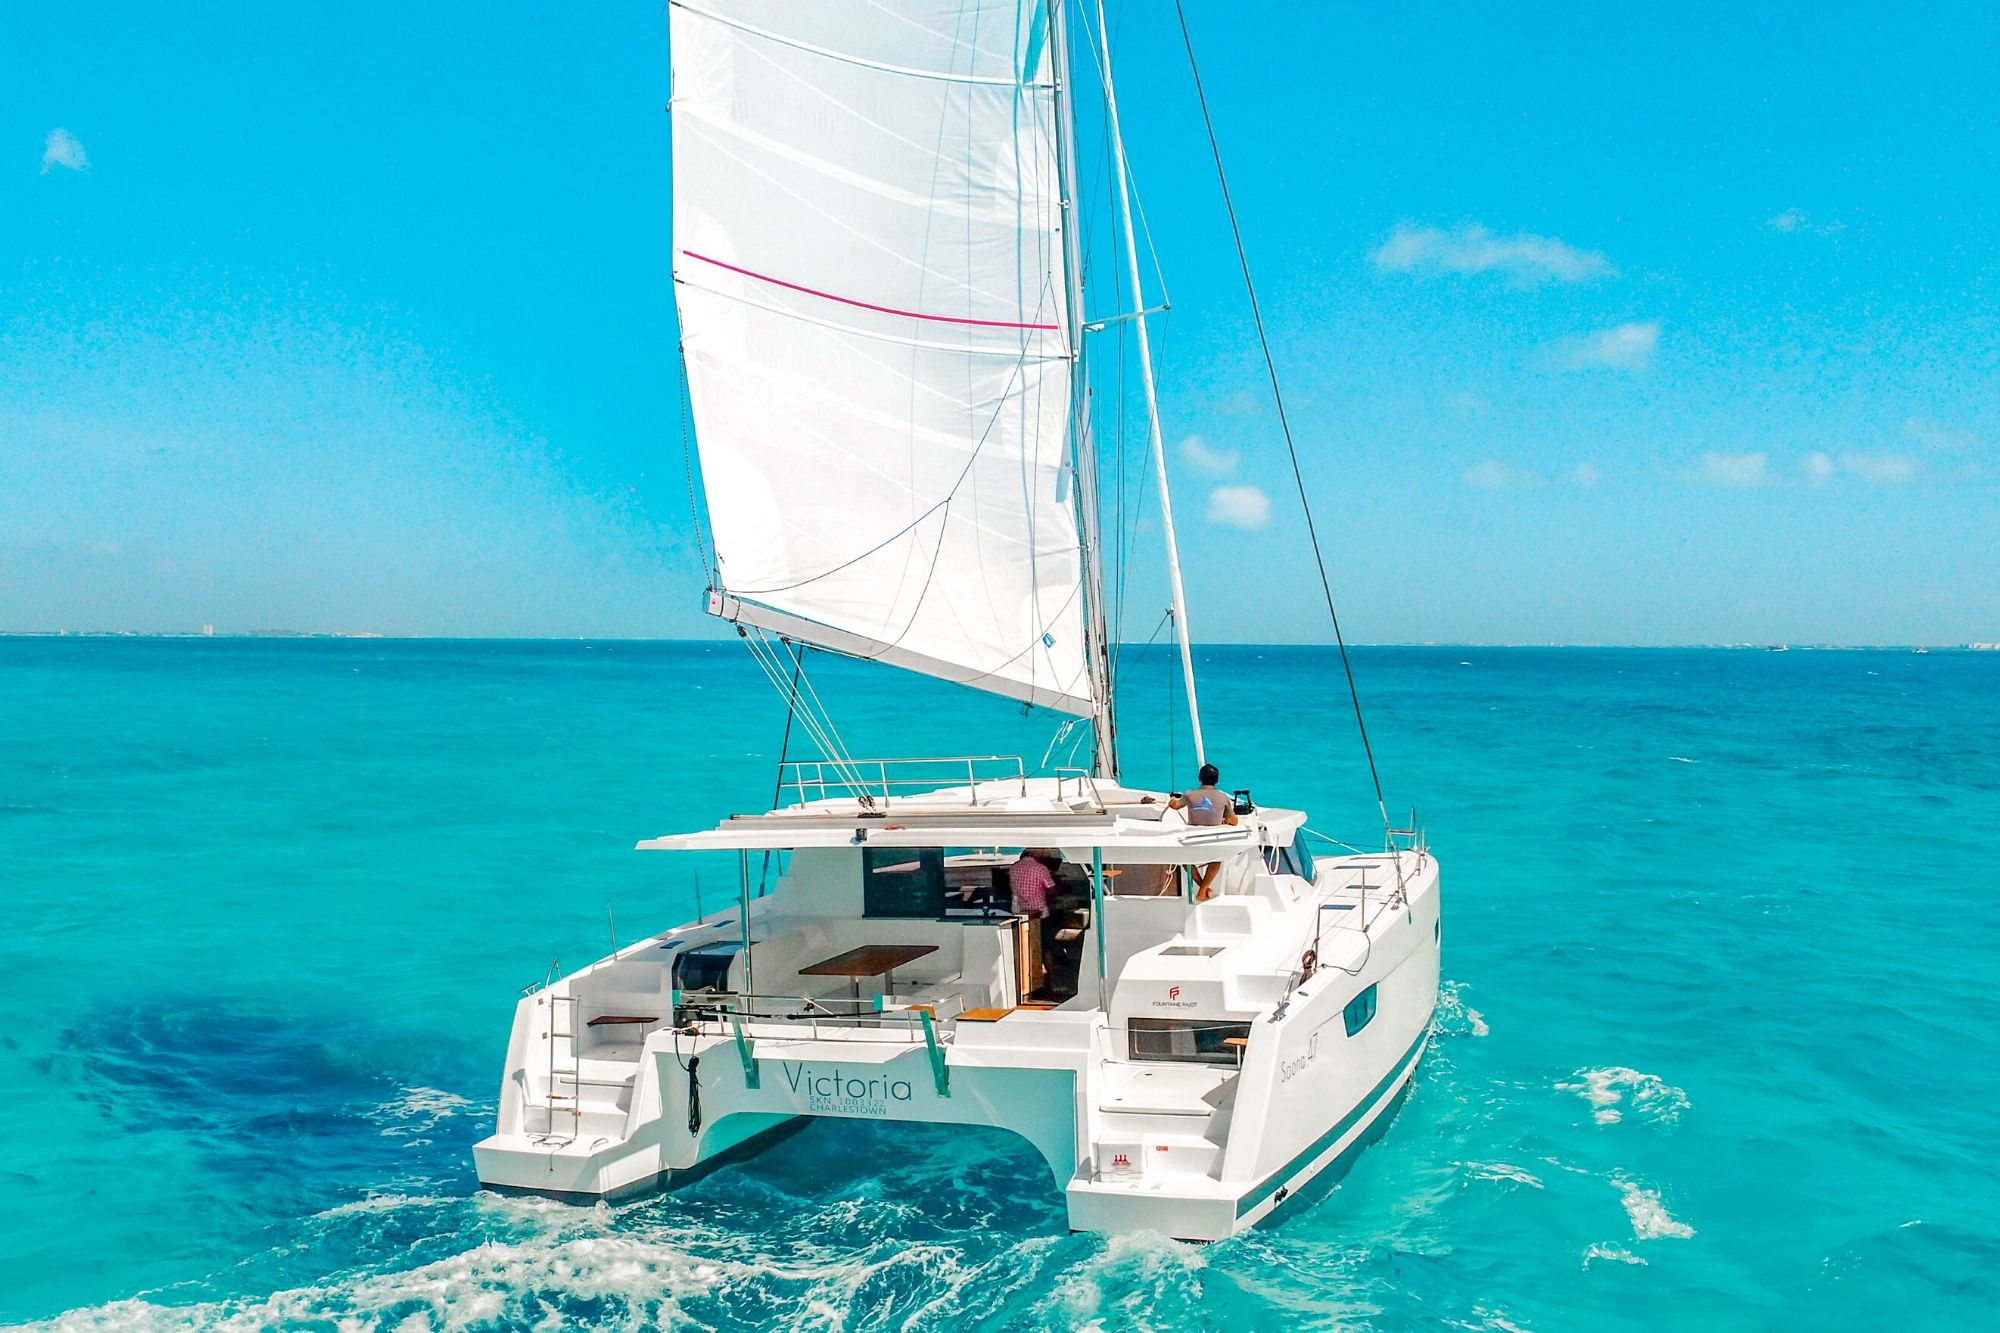 2 - HiRes - Private Isla Mujeres tour in catamaran - Victoria - Cancun Sailing